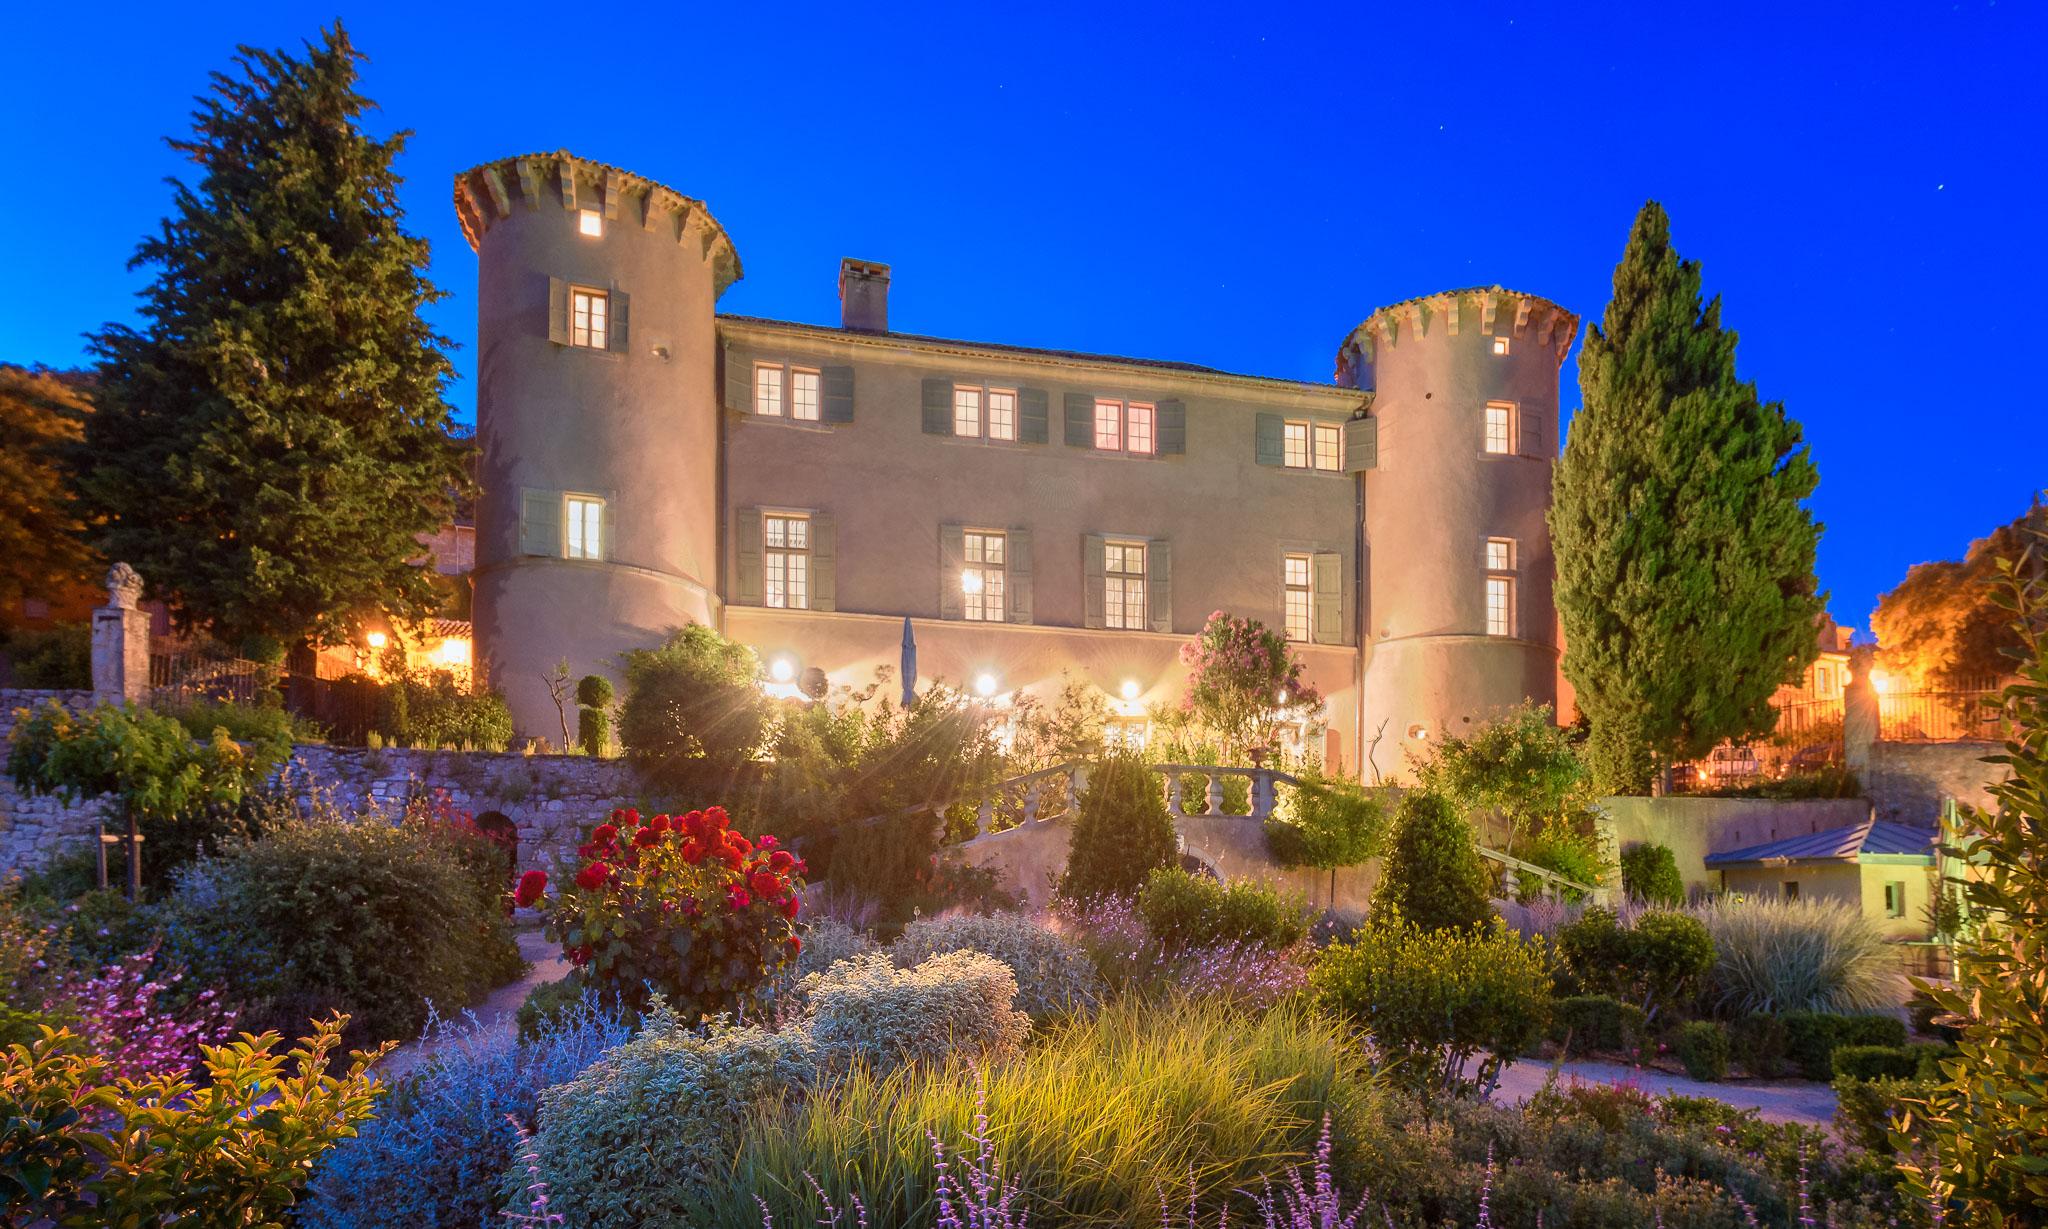 Chateau arboras nocturne 14-06-7.jpg